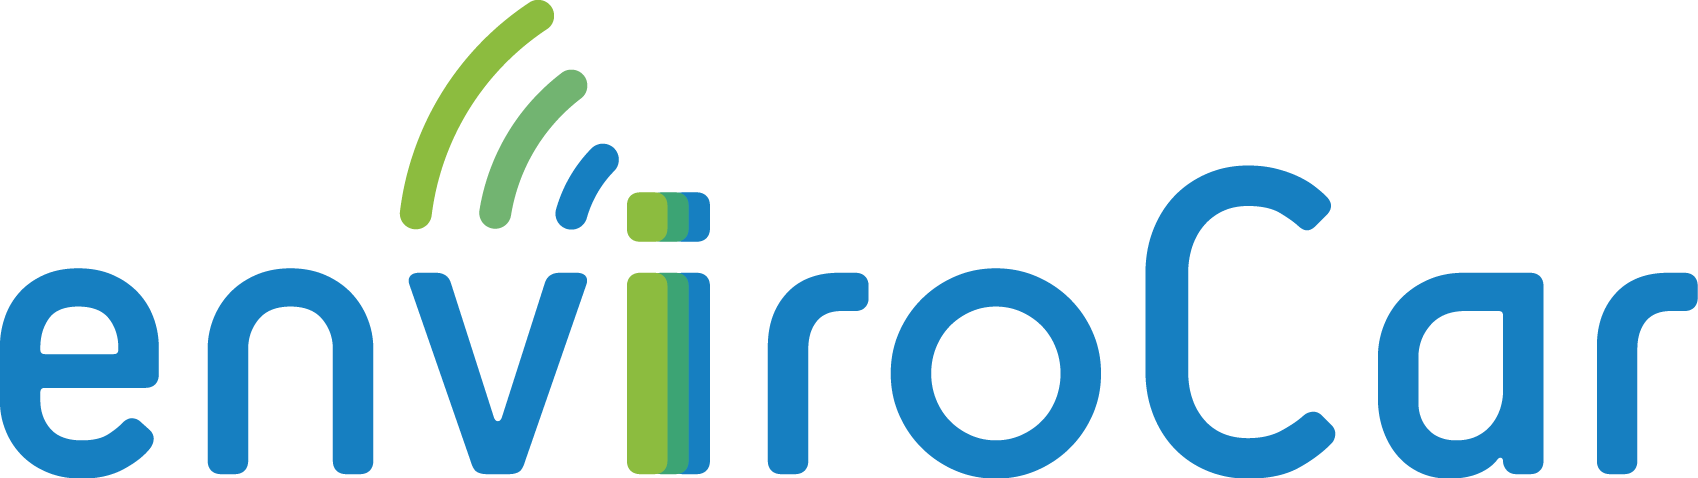 final_envirocar_logo.png